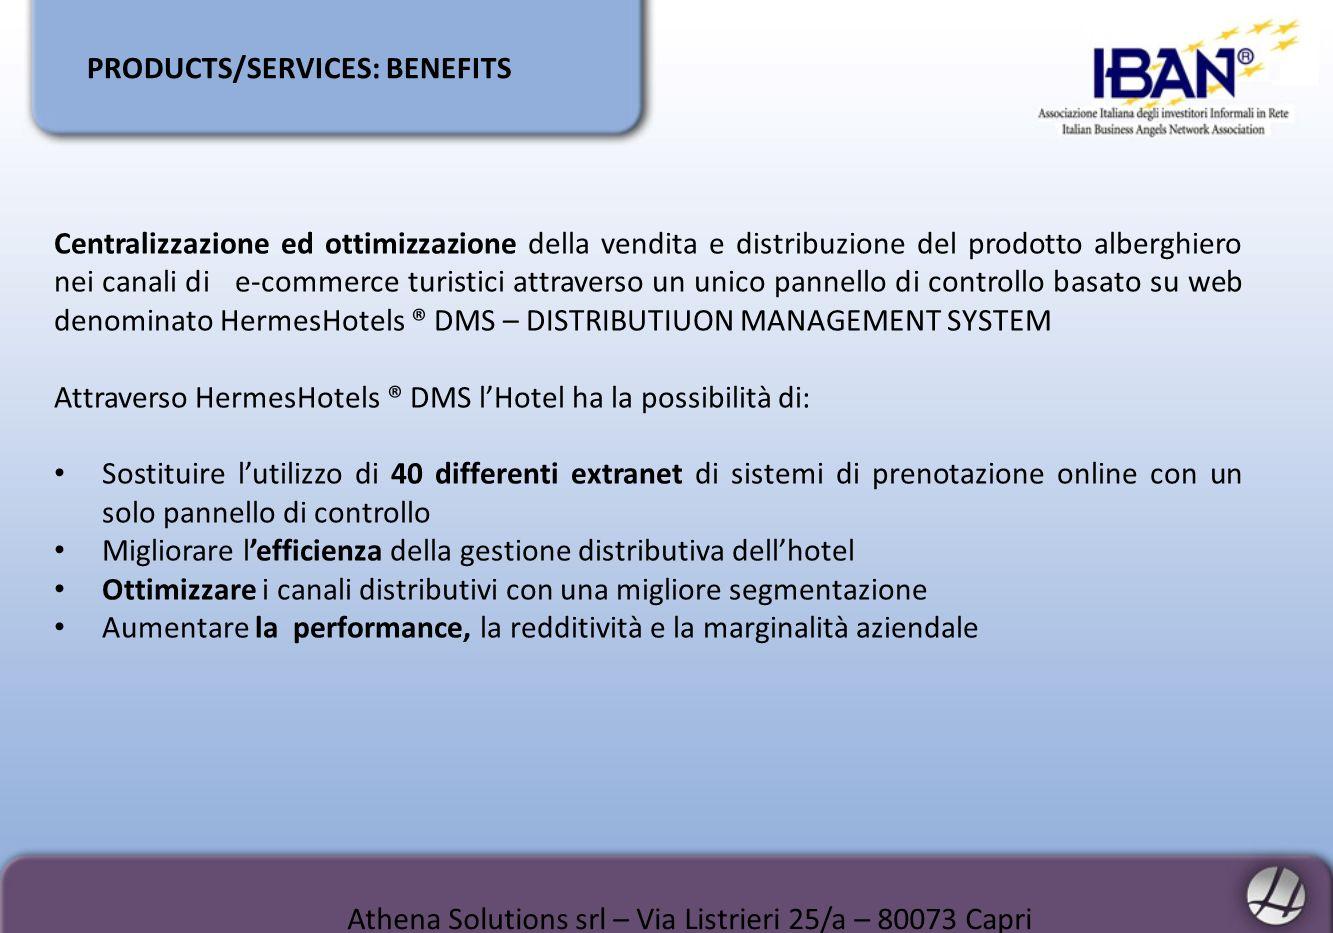 Athena Solutions srl – Via Listrieri 25/a – 80073 Capri